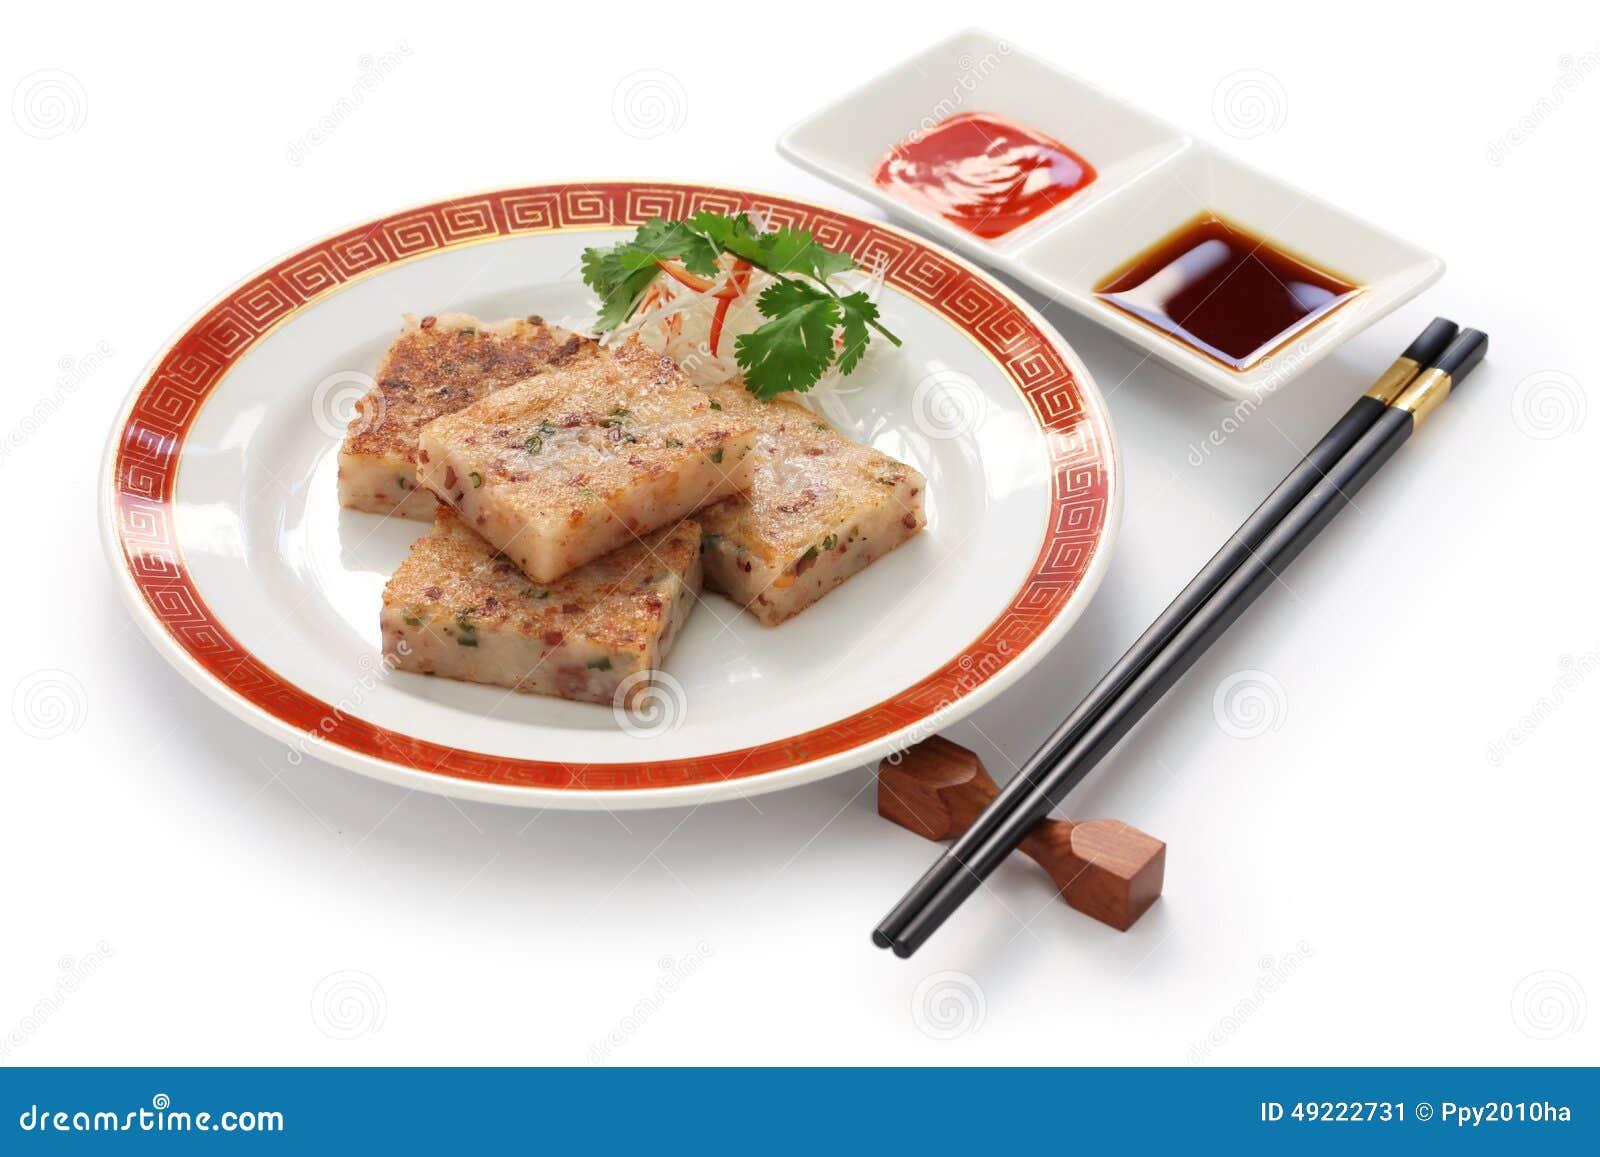 Turnip Cake With Chinese Sausage